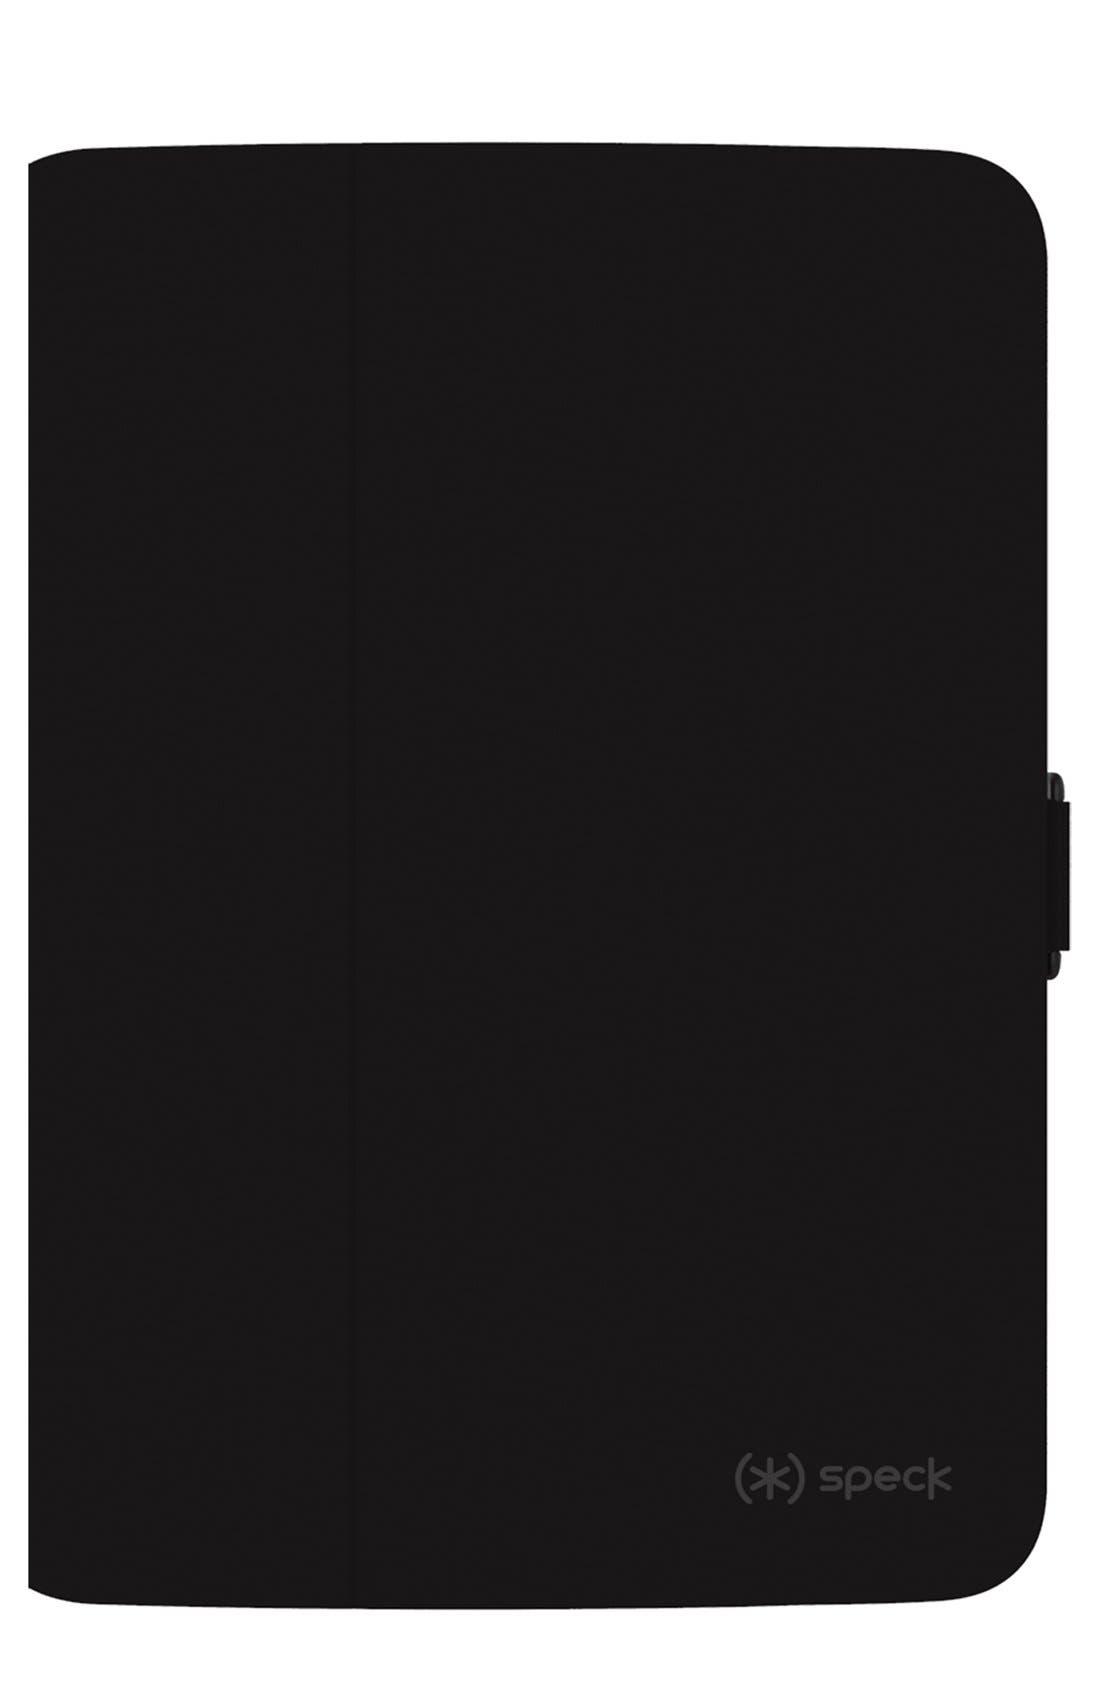 Main Image - Speck 'FitFolio' Samsung Galaxy Tab 3 Case